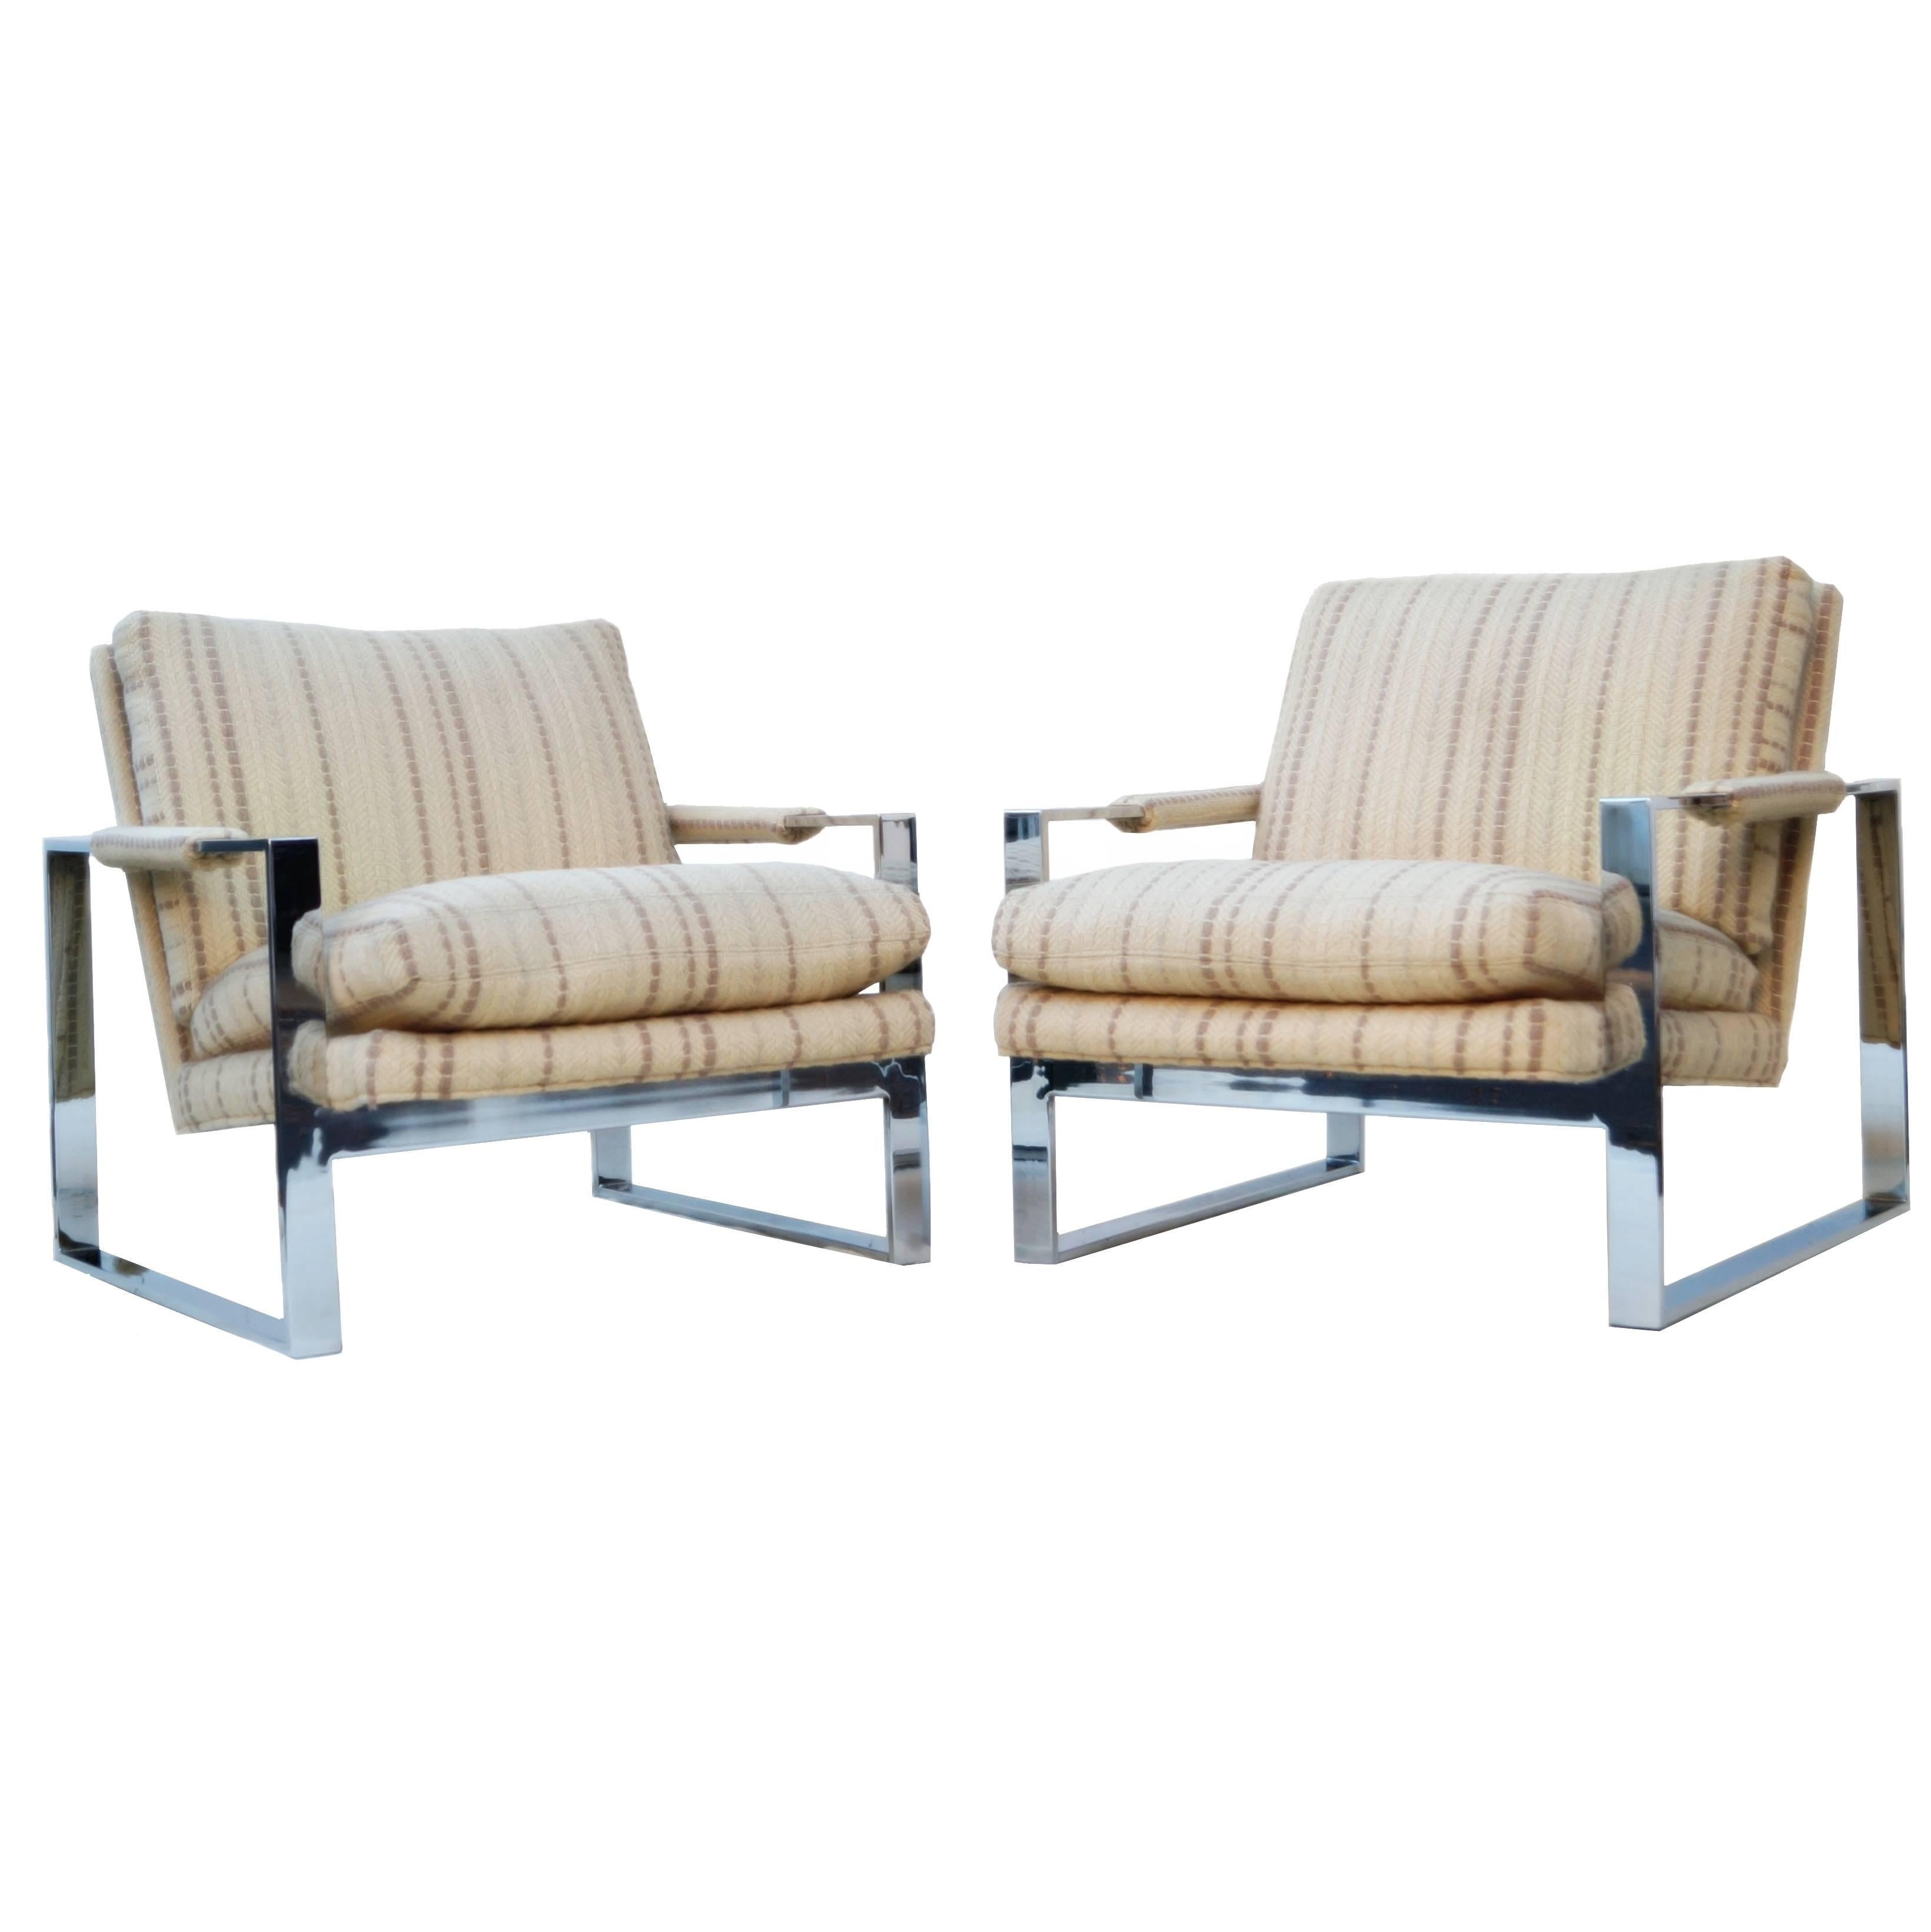 Pair of Milo Baughman Thayer Coggin Flat Bar Lounge Chairs